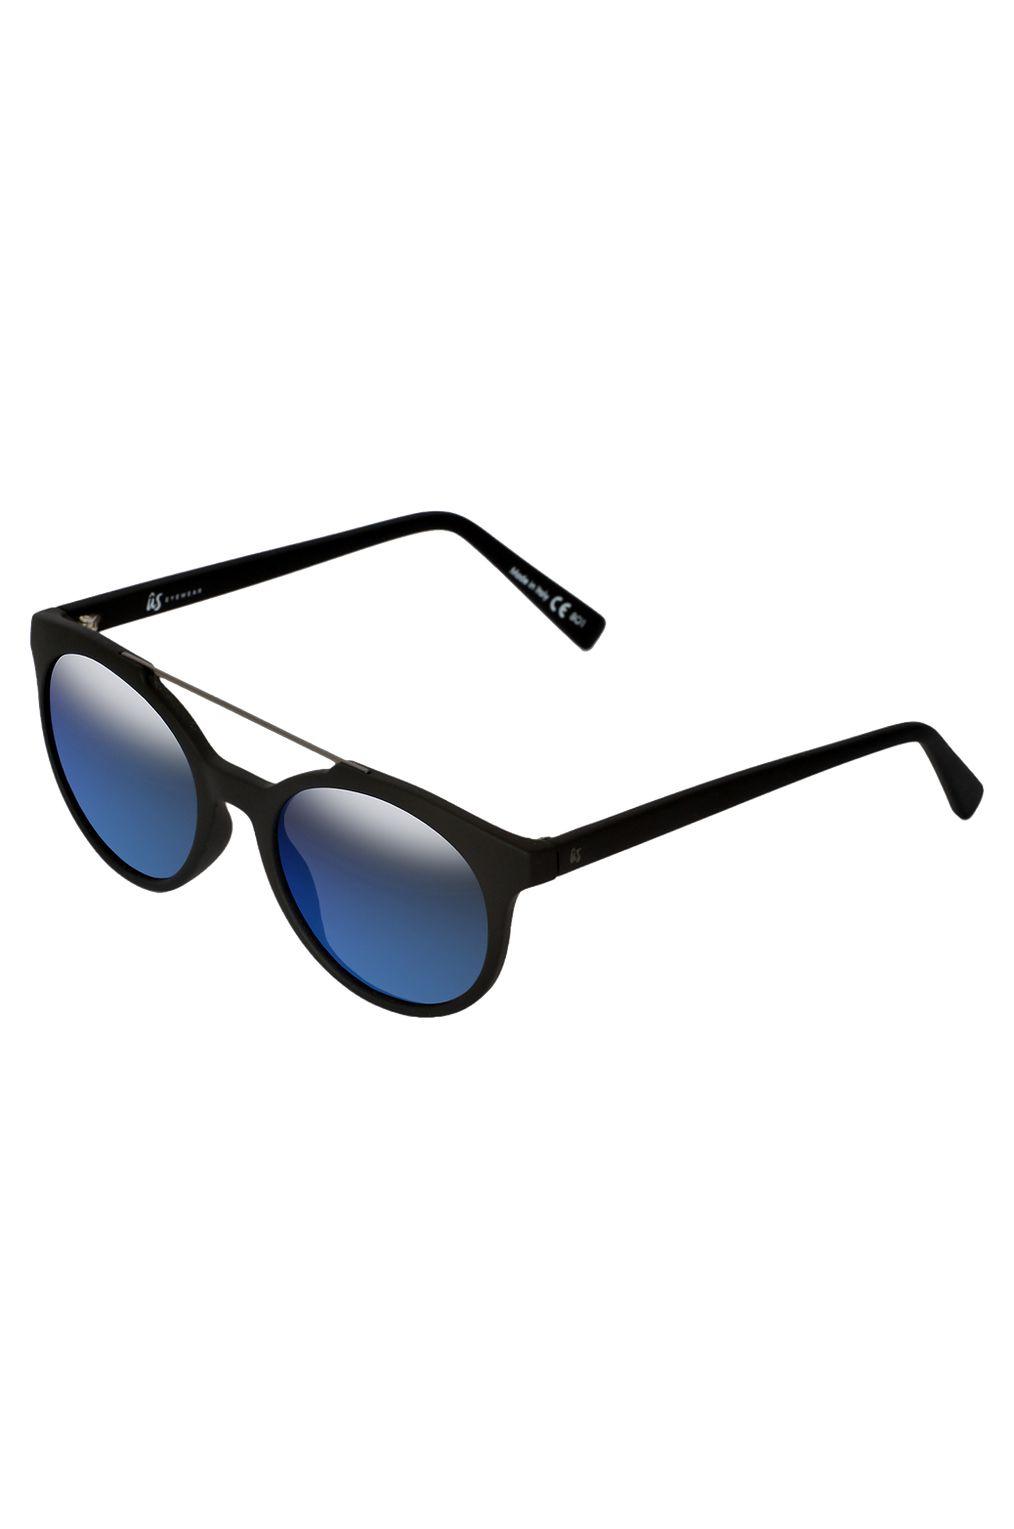 US Sunglasses CALIX Matte Black/Grey Blue Chrome